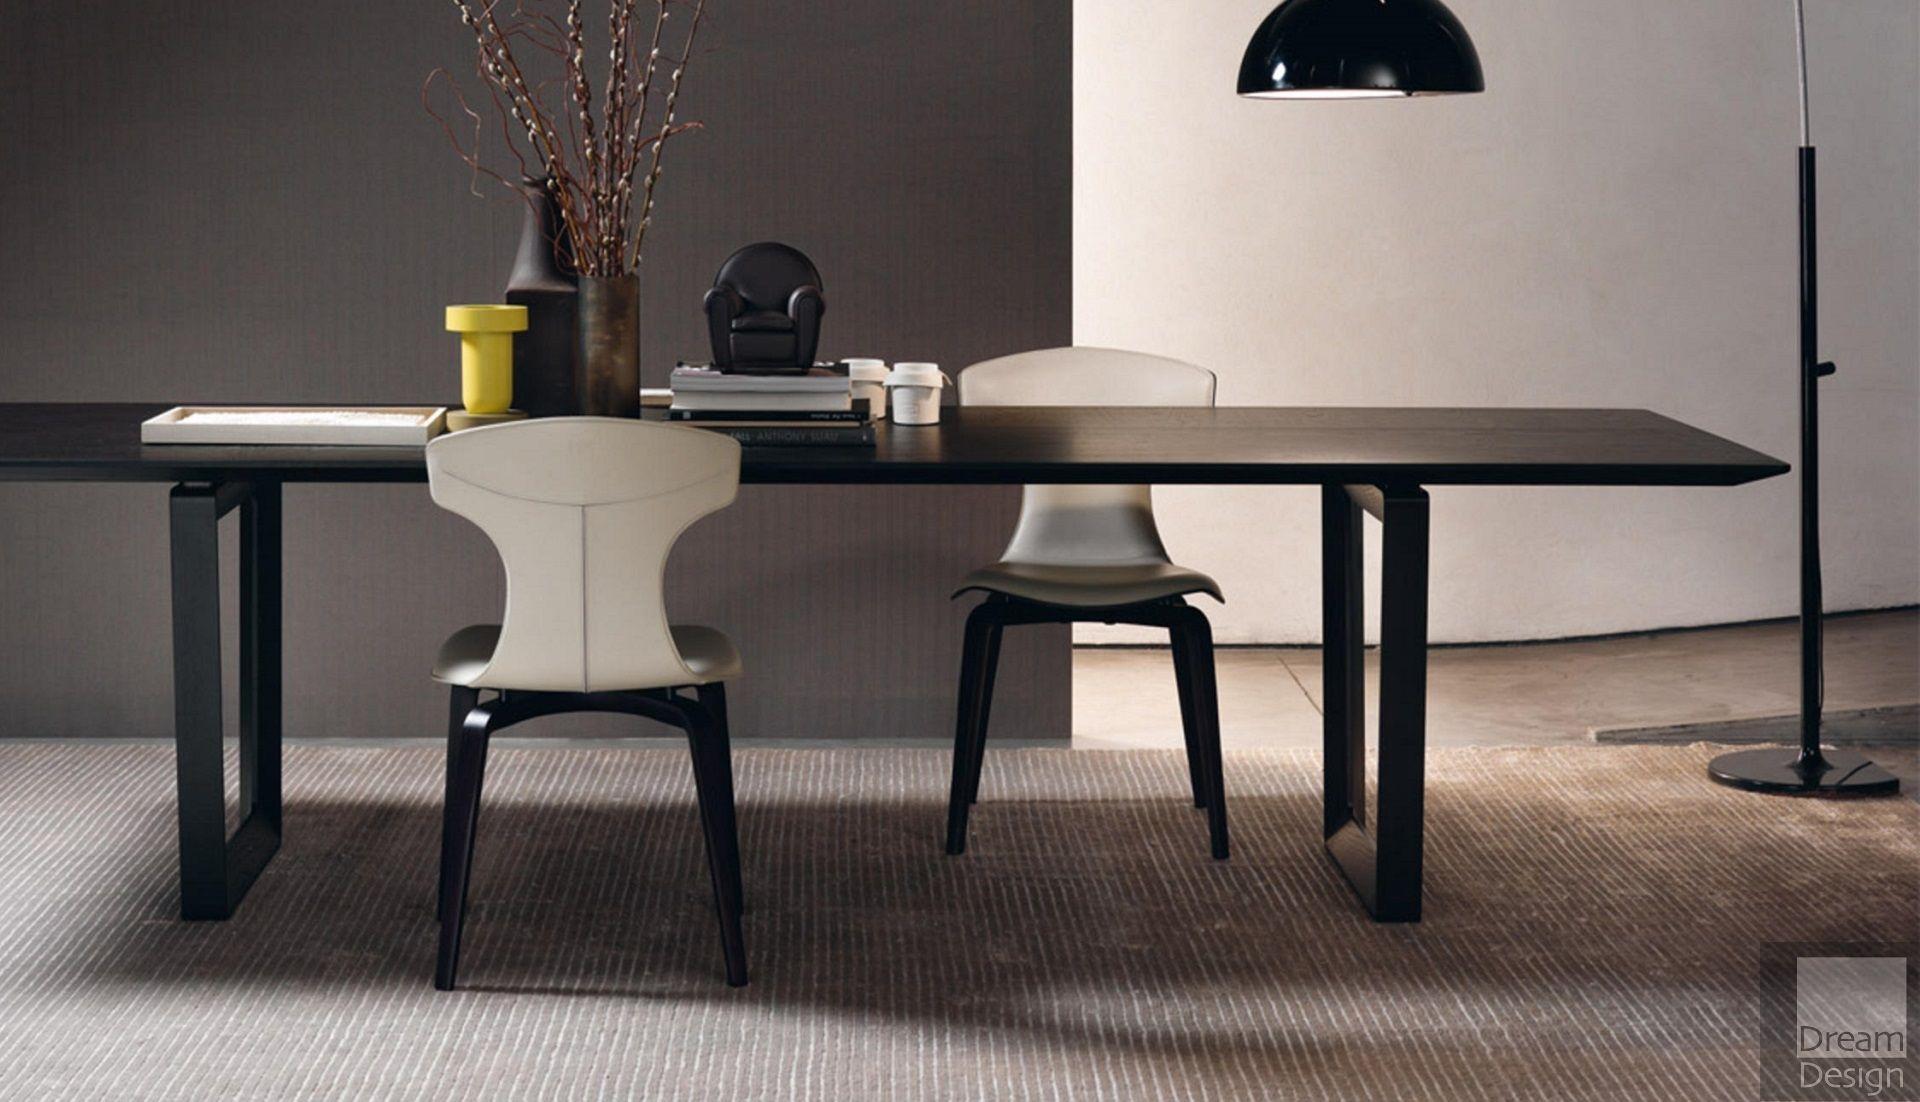 poltrona frau bolero table by roberto lazzeroni everything but ordinary. Black Bedroom Furniture Sets. Home Design Ideas